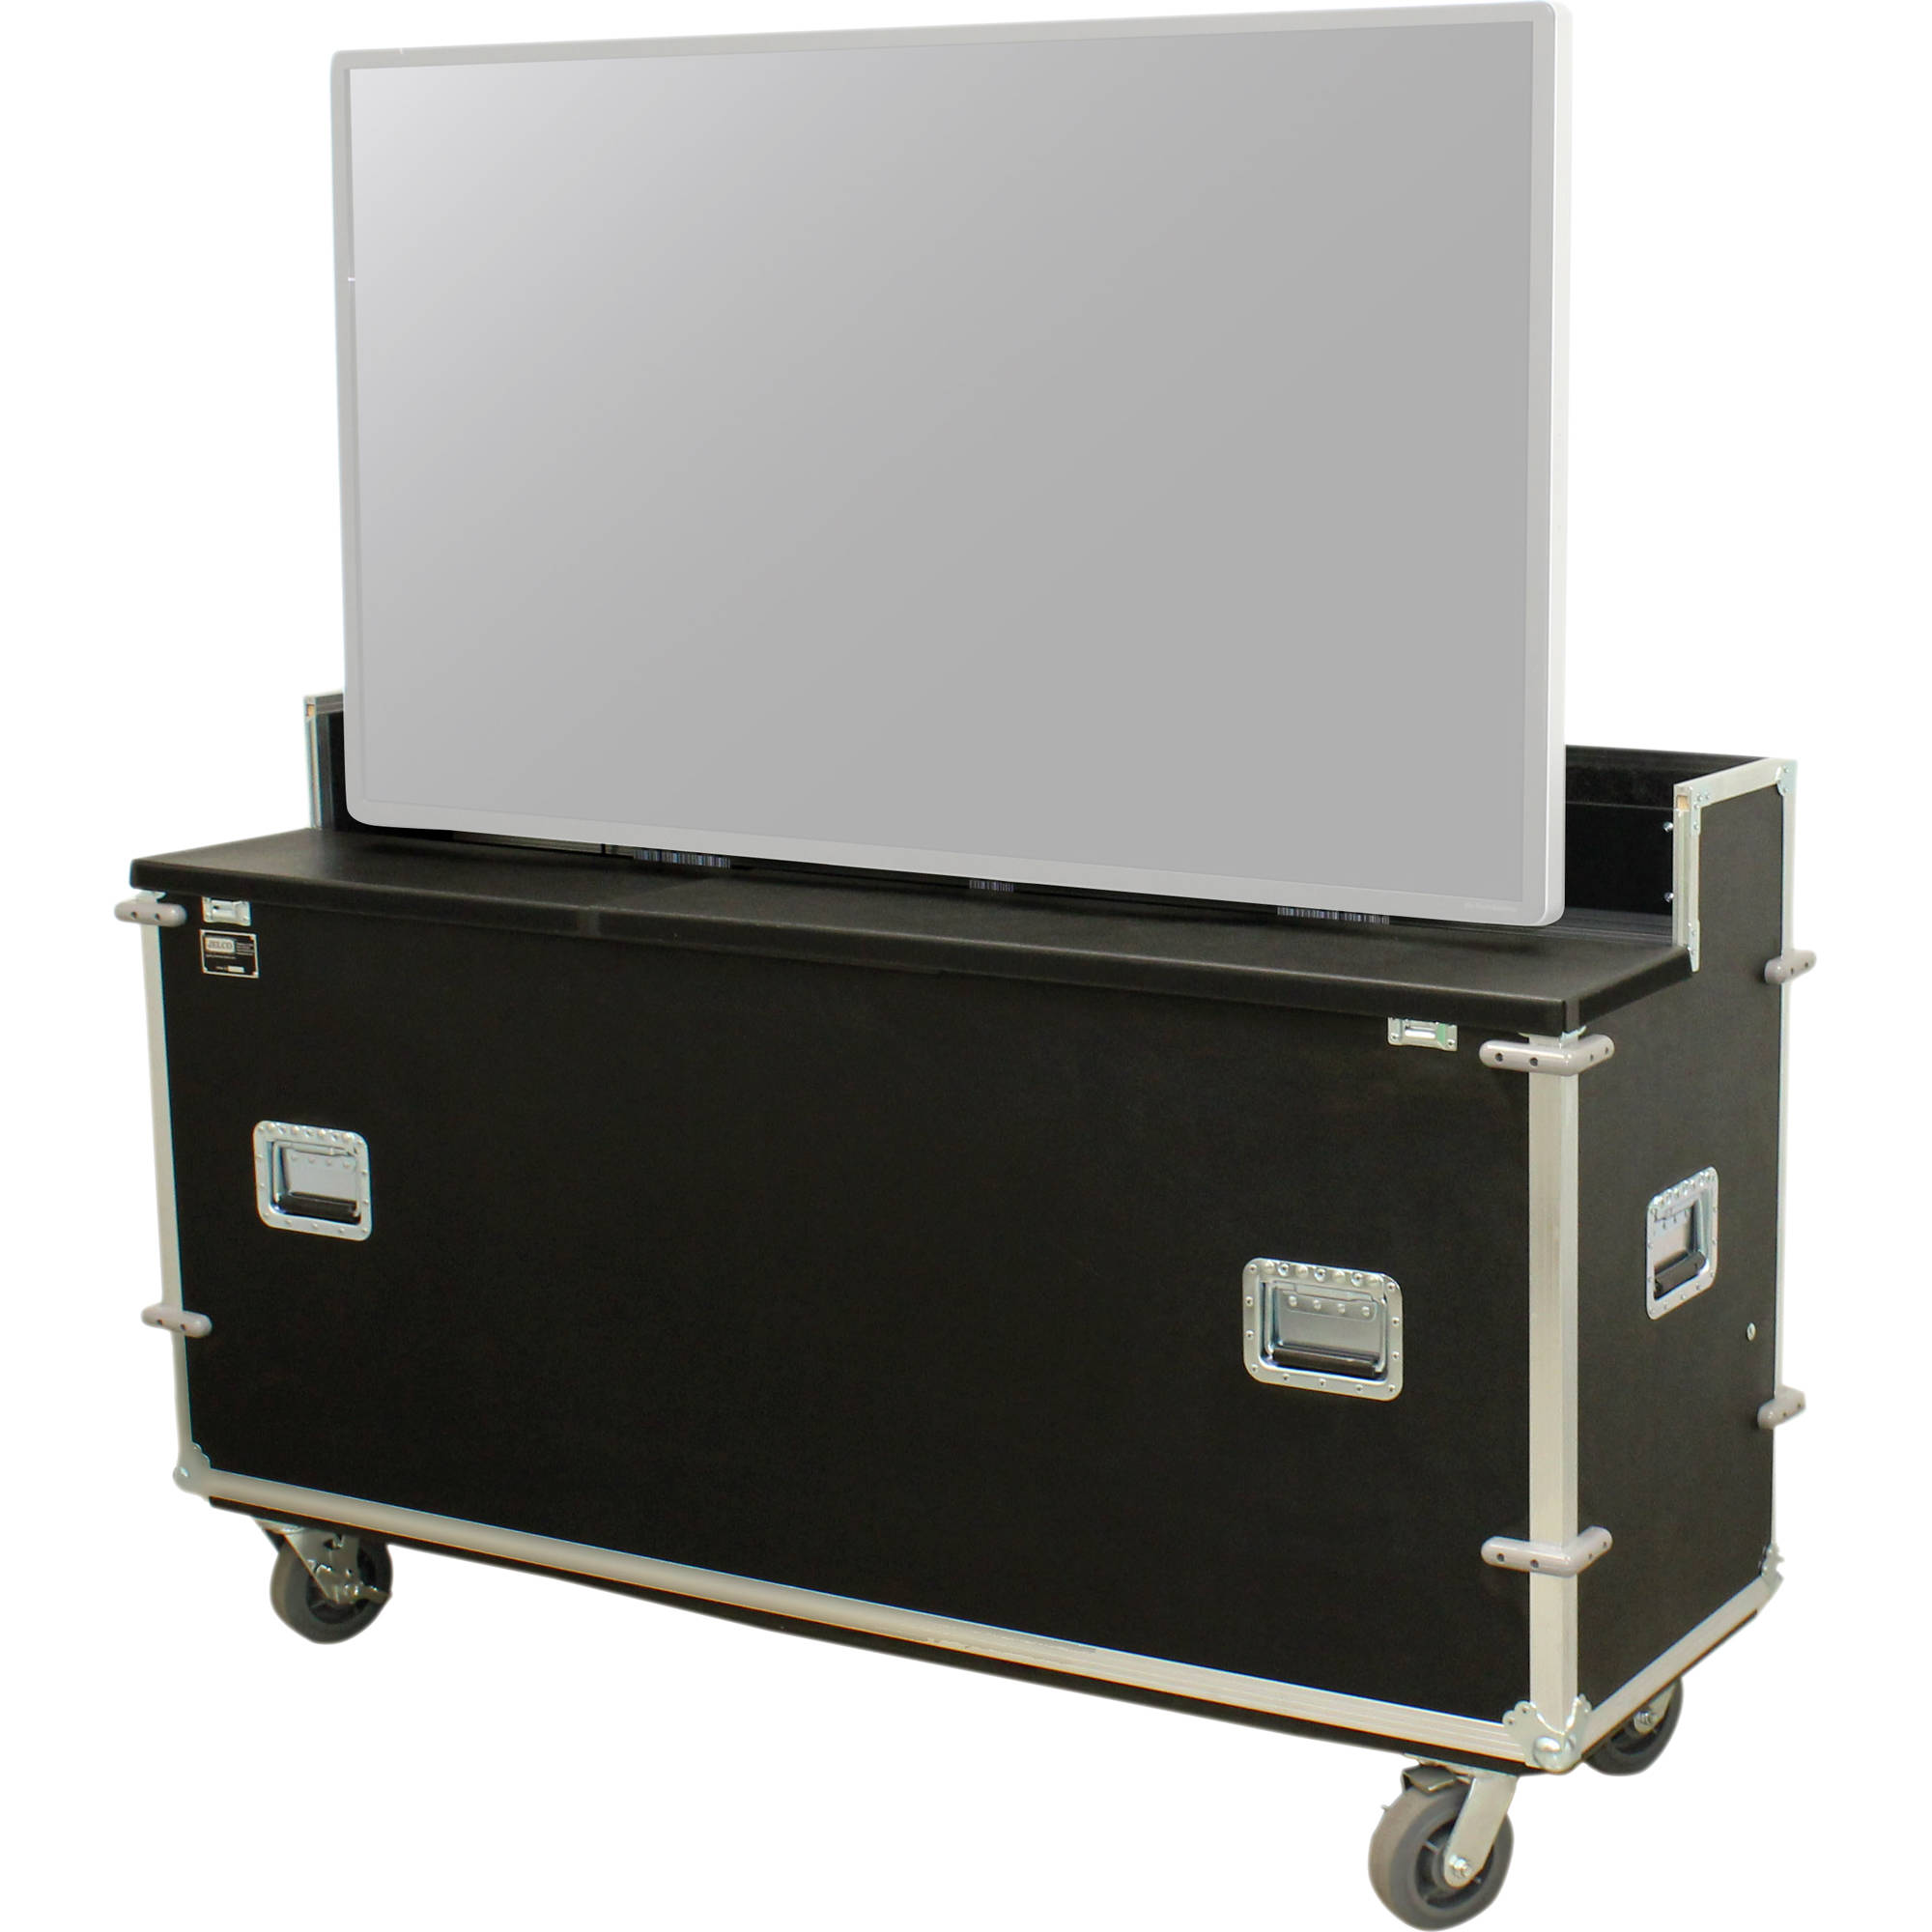 JELCO EL-70 EZ-LIFT Shipping and Display Case EL-70 B&H Photo